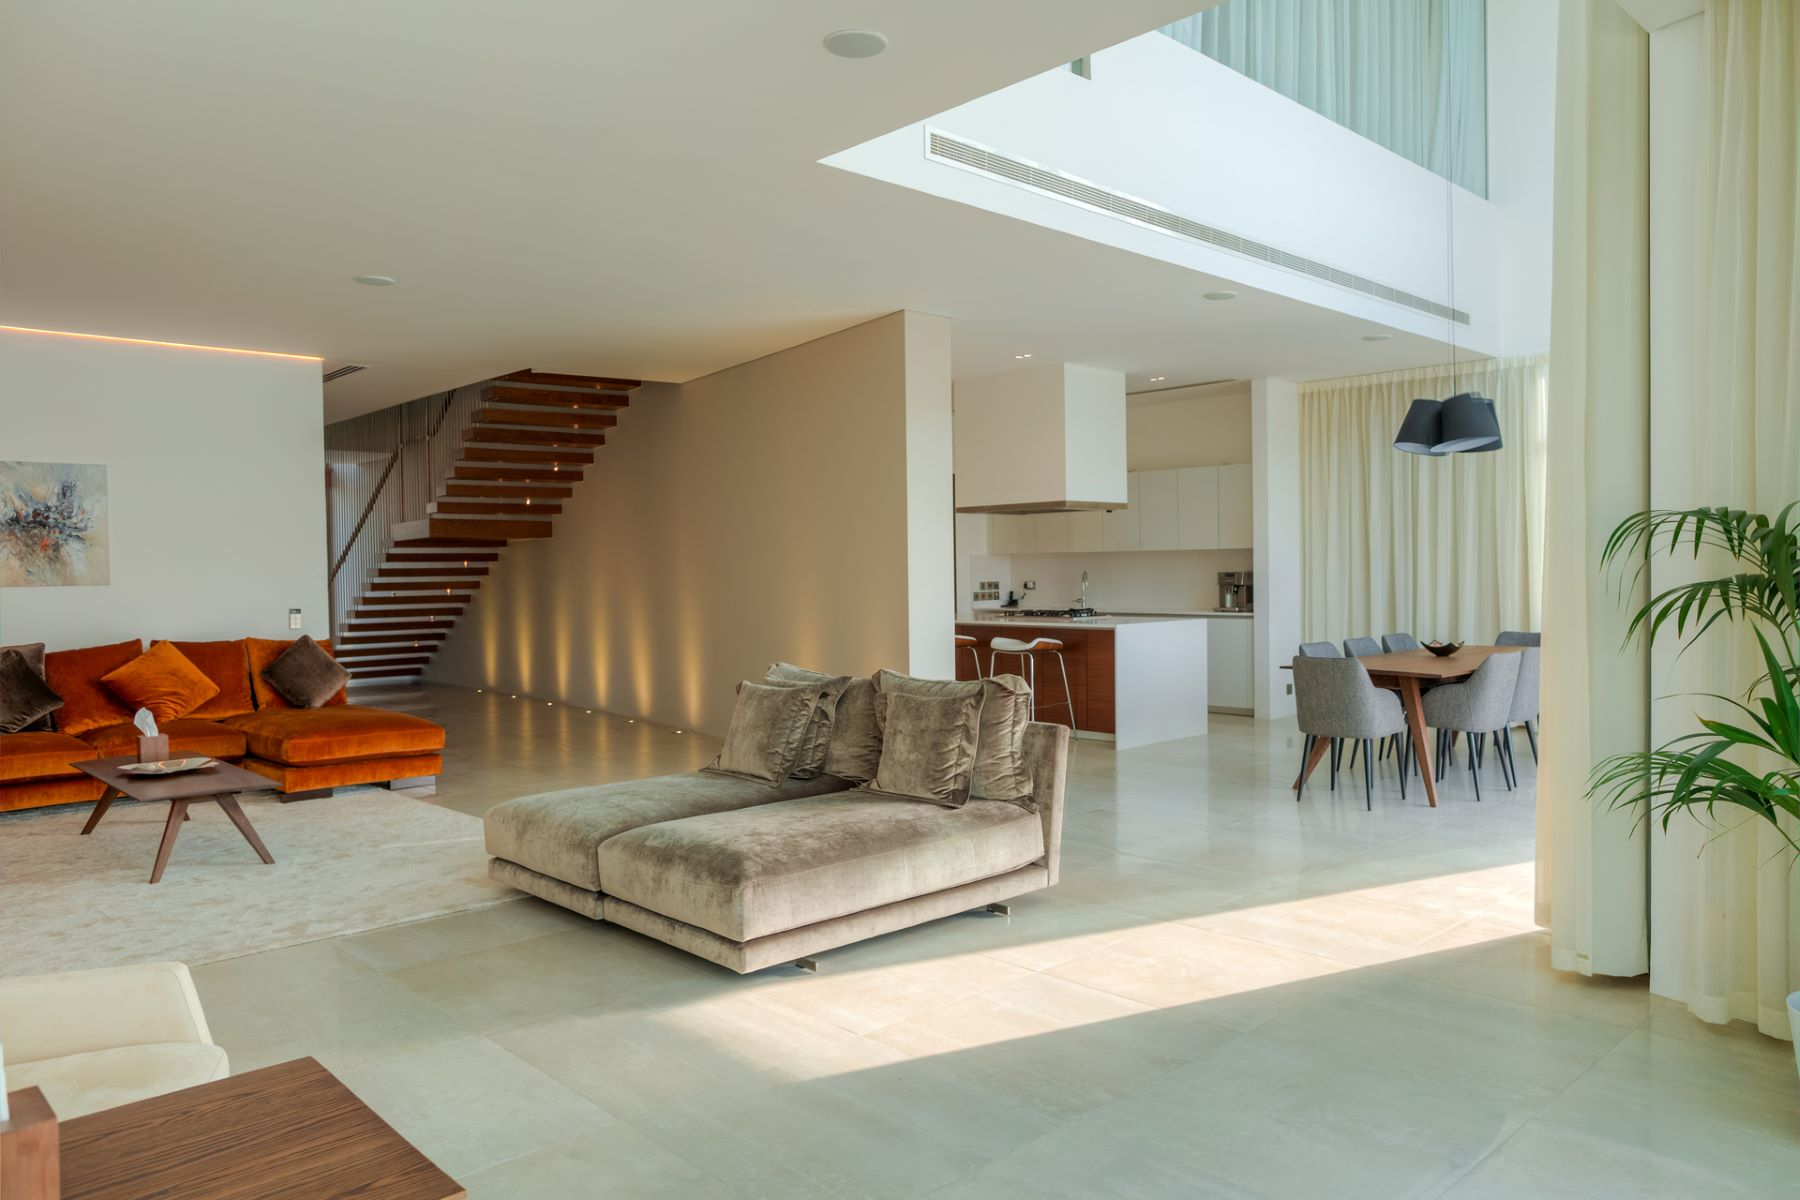 Property for Sale at Modern Style 5BR Brand New Atlantis view Garden Homes Palm Jumeirah Dubai, Dubai 12345 United Arab Emirates